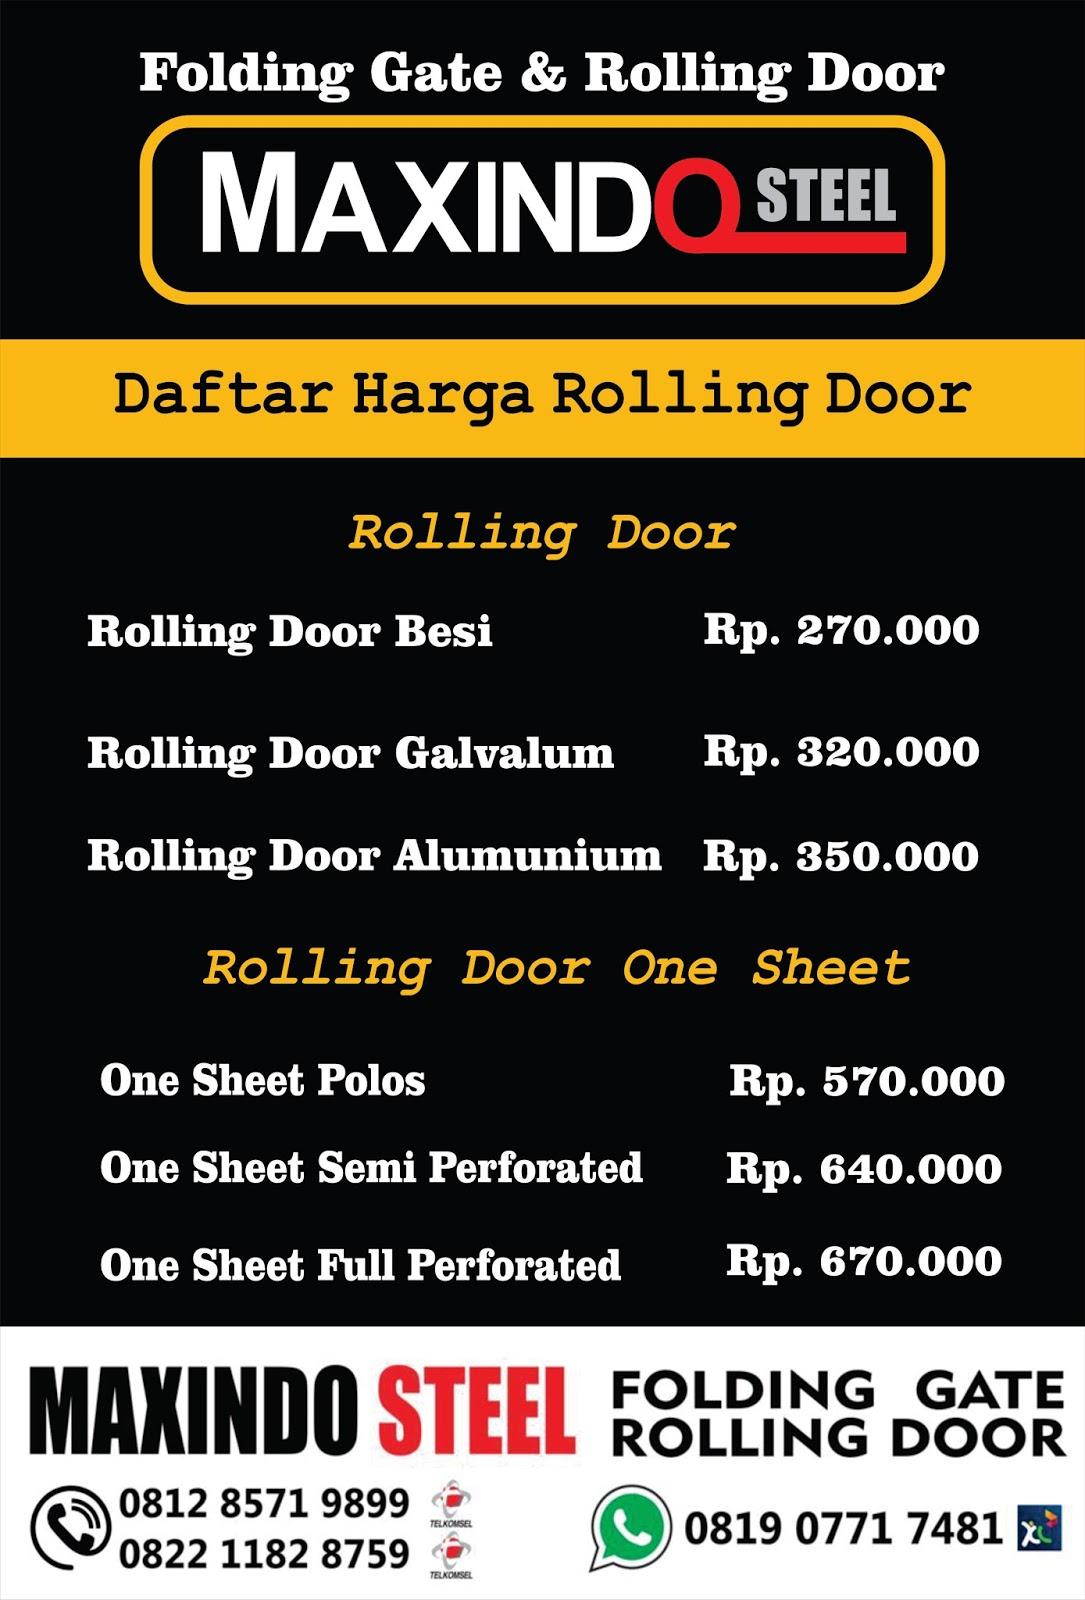 DAFTAR HARGA ROLLING DOOR DAN FOLDING GATE : DAFTAR HARGA FOLDING ...